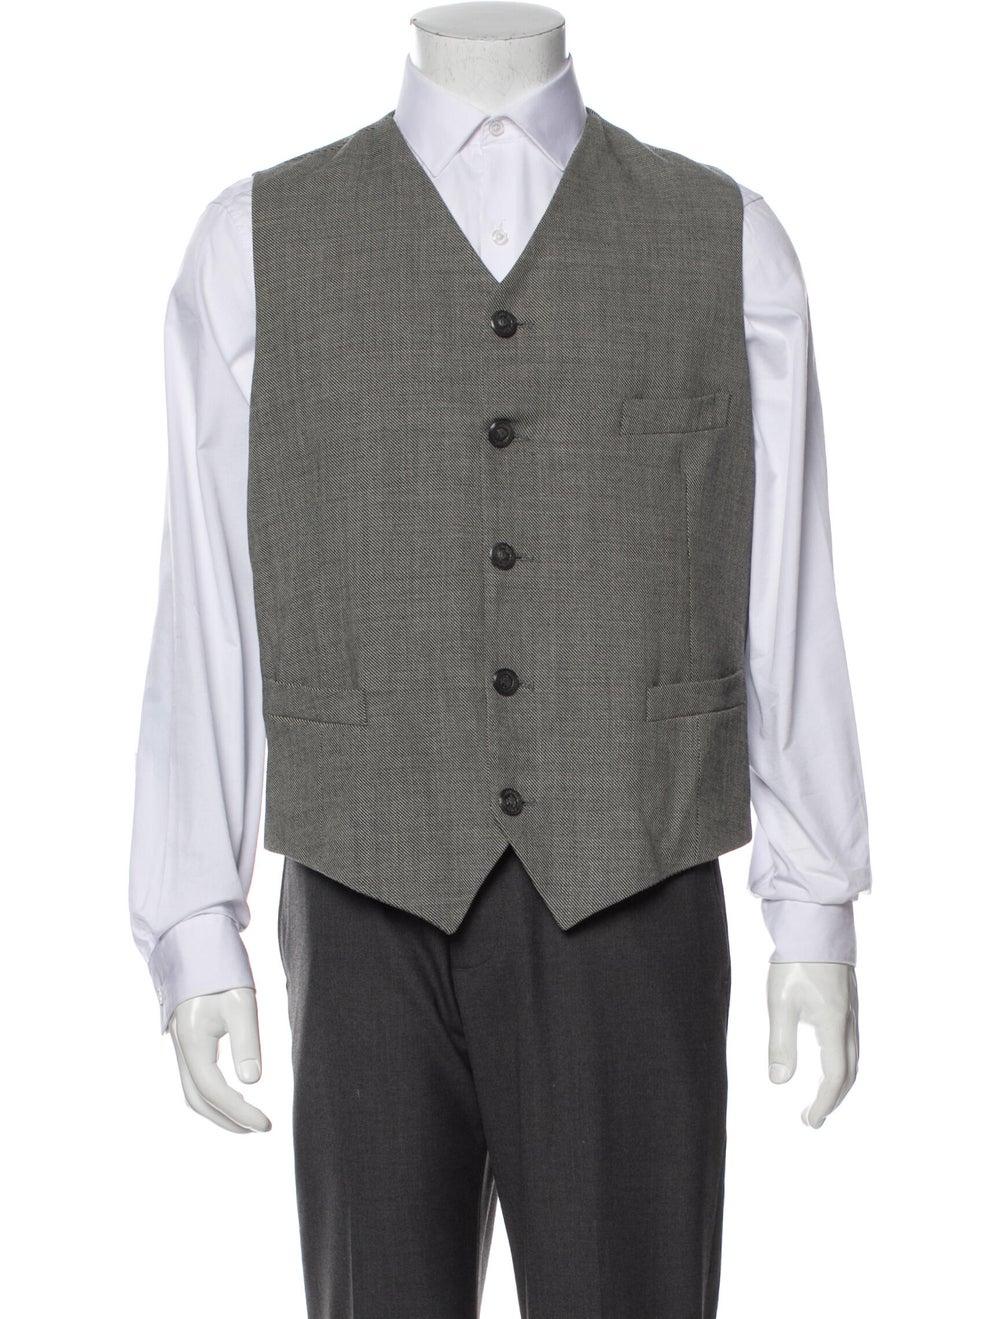 Gianni Versace Wool Two-Piece Blazer Wool - image 4